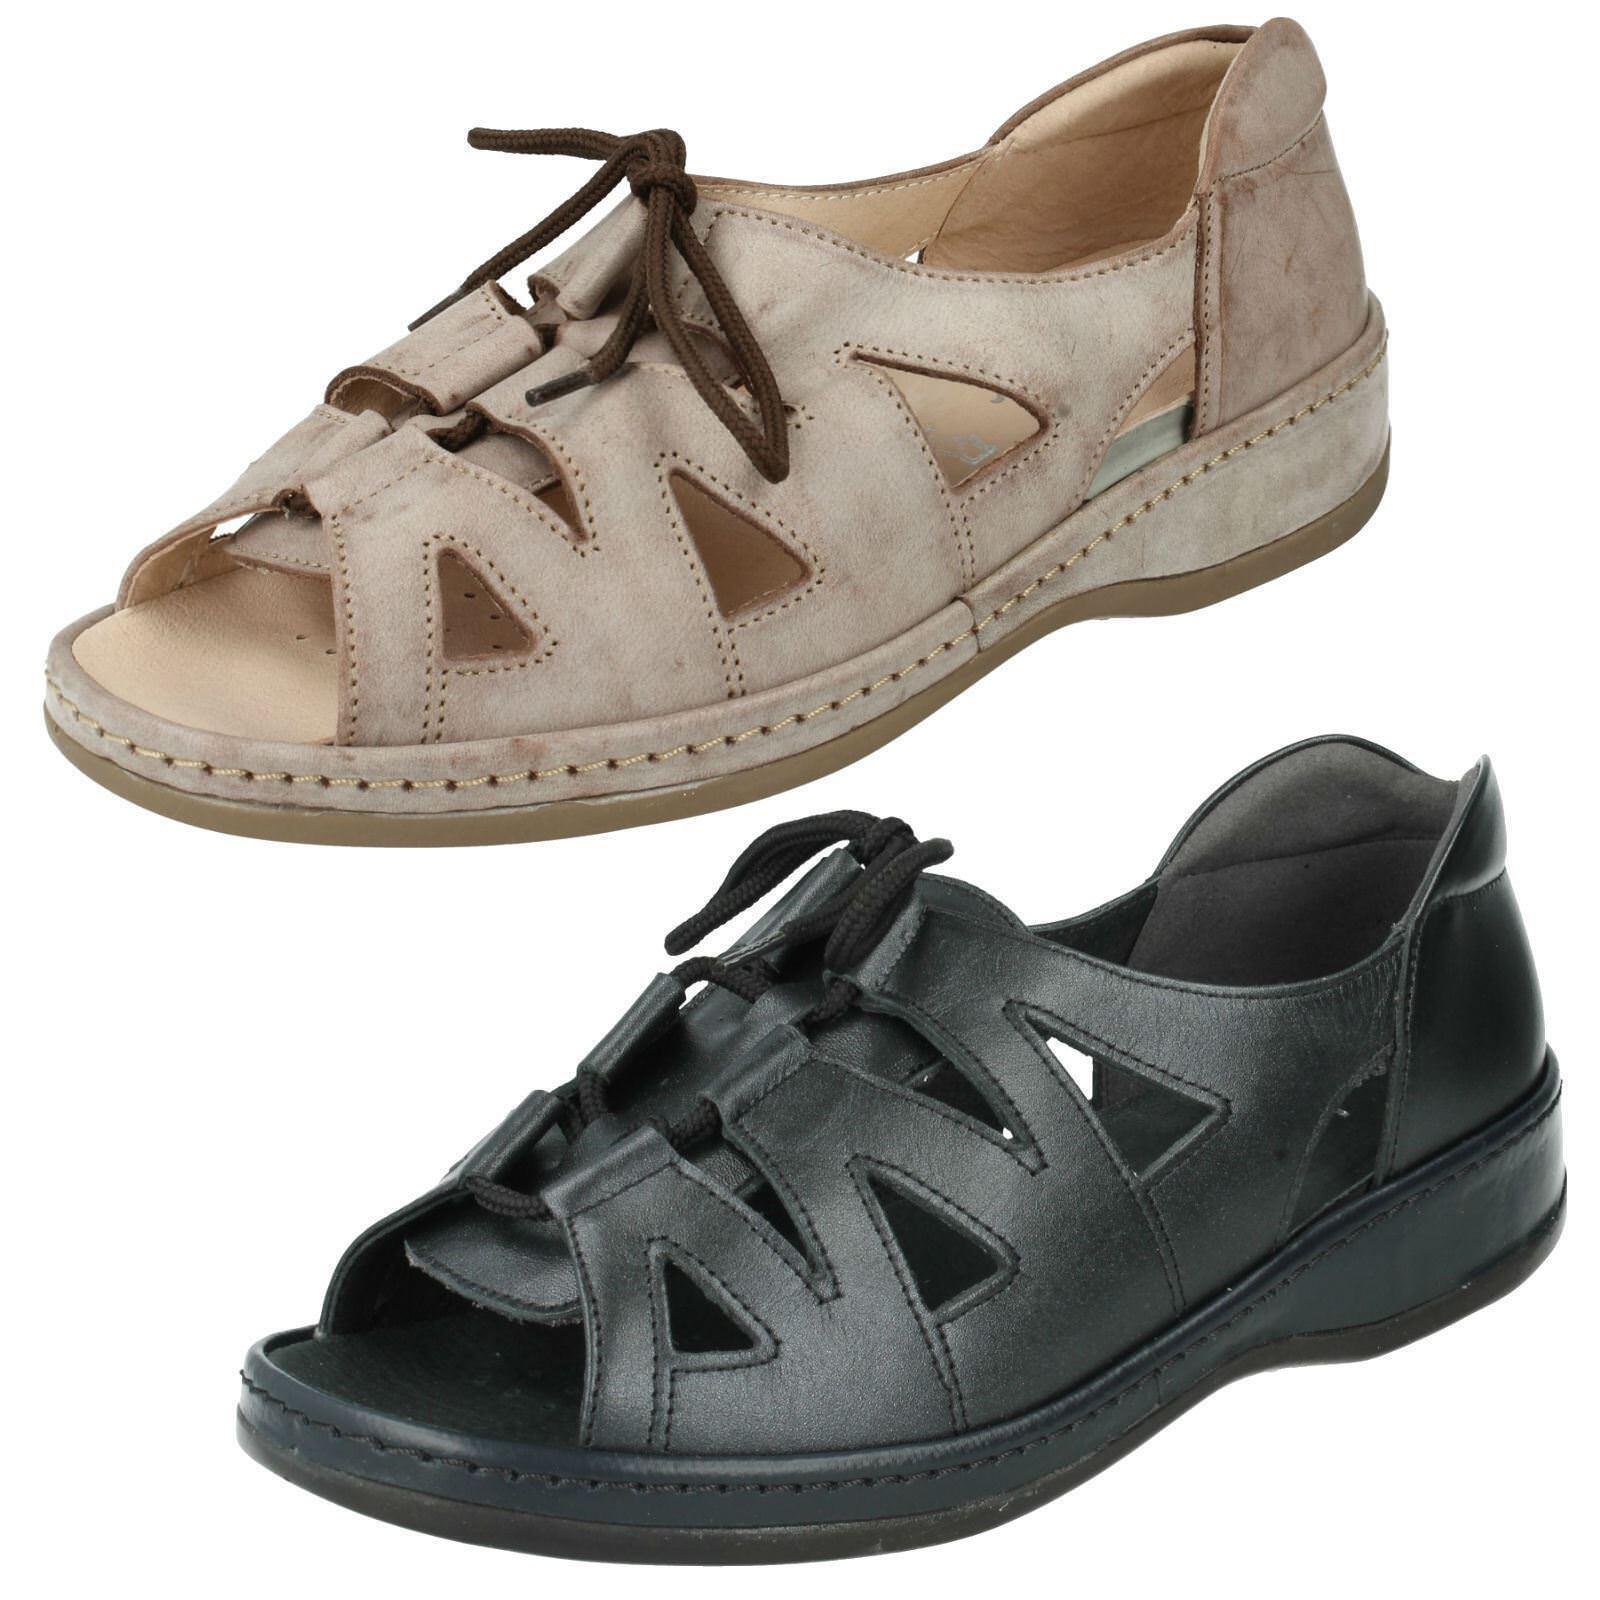 Sandpiper Cassie Heel Leather Upper / Lined 1